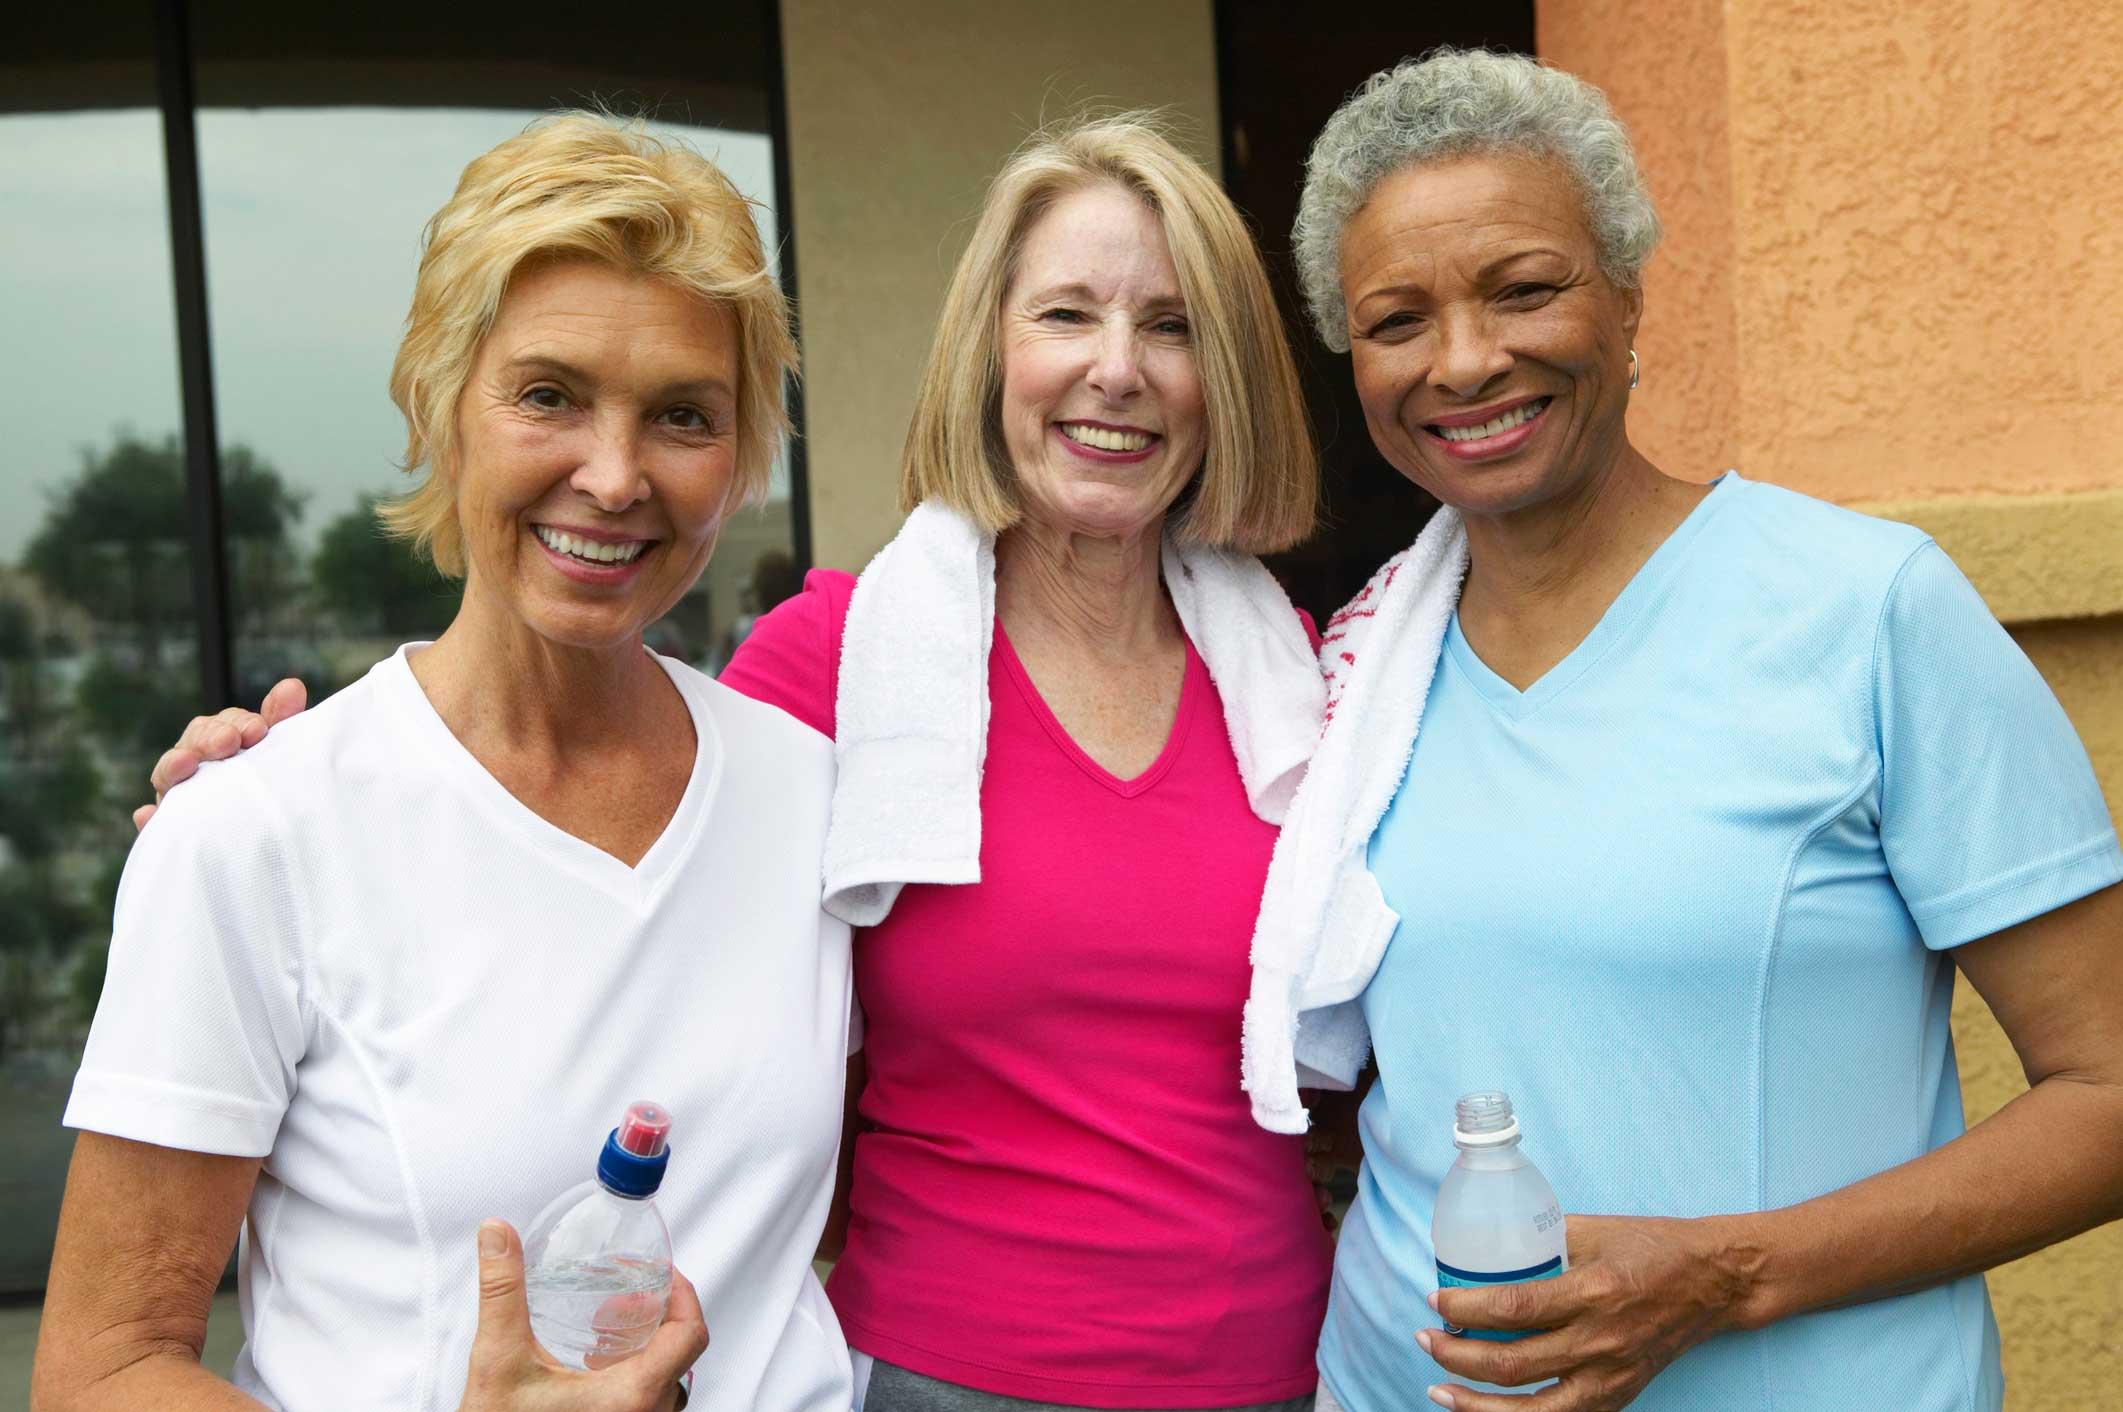 A Breast Surgeon Who's Also A Breast Cancer Survivor on Risk Factors